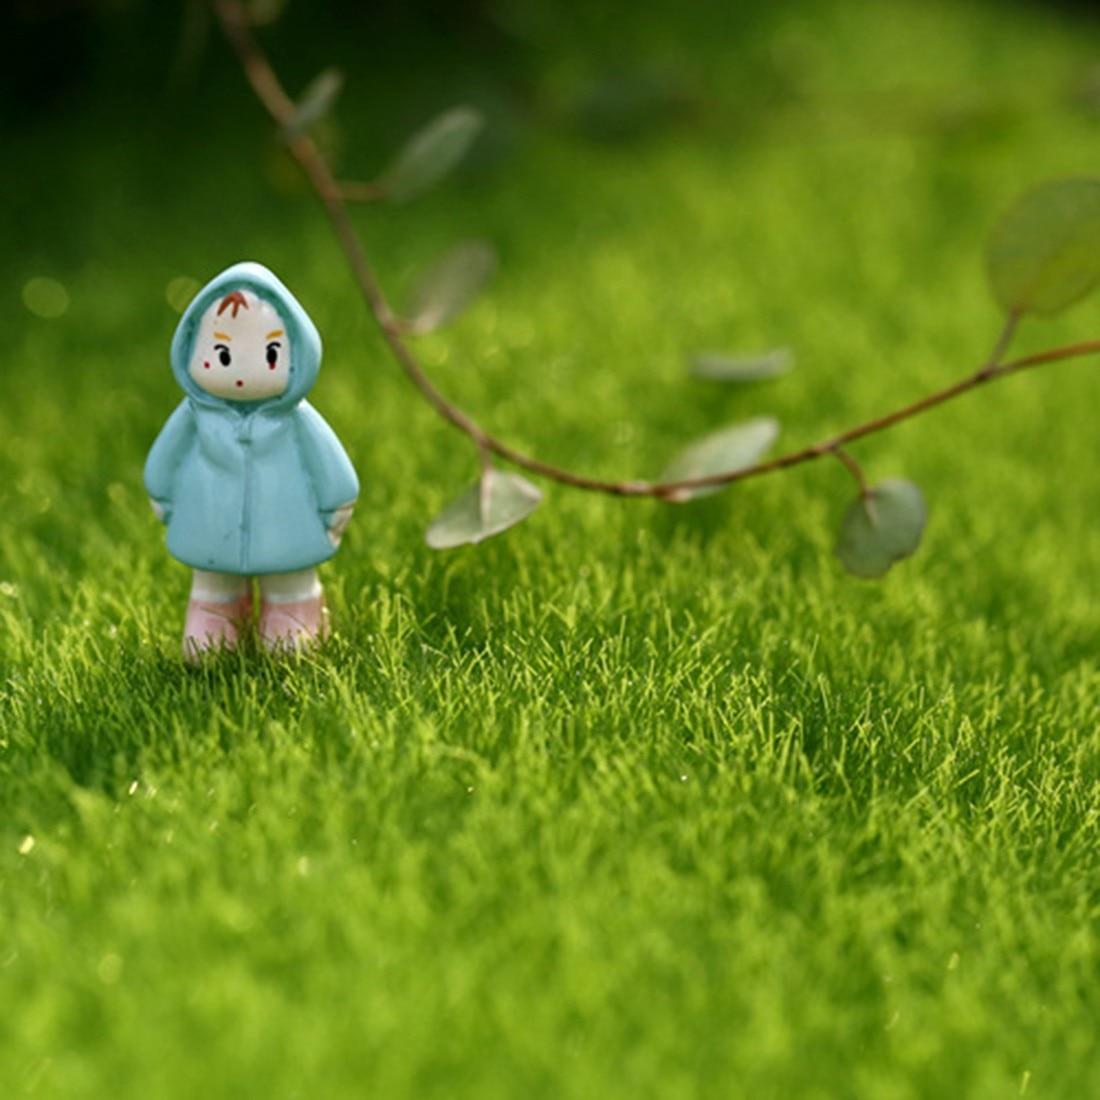 Fairy lawn ornaments - Fake Moss Miniature Garden Ornament Diy Mushroom Craft Pot Fairy Artificial Lawn Grass For Wedding Xmas